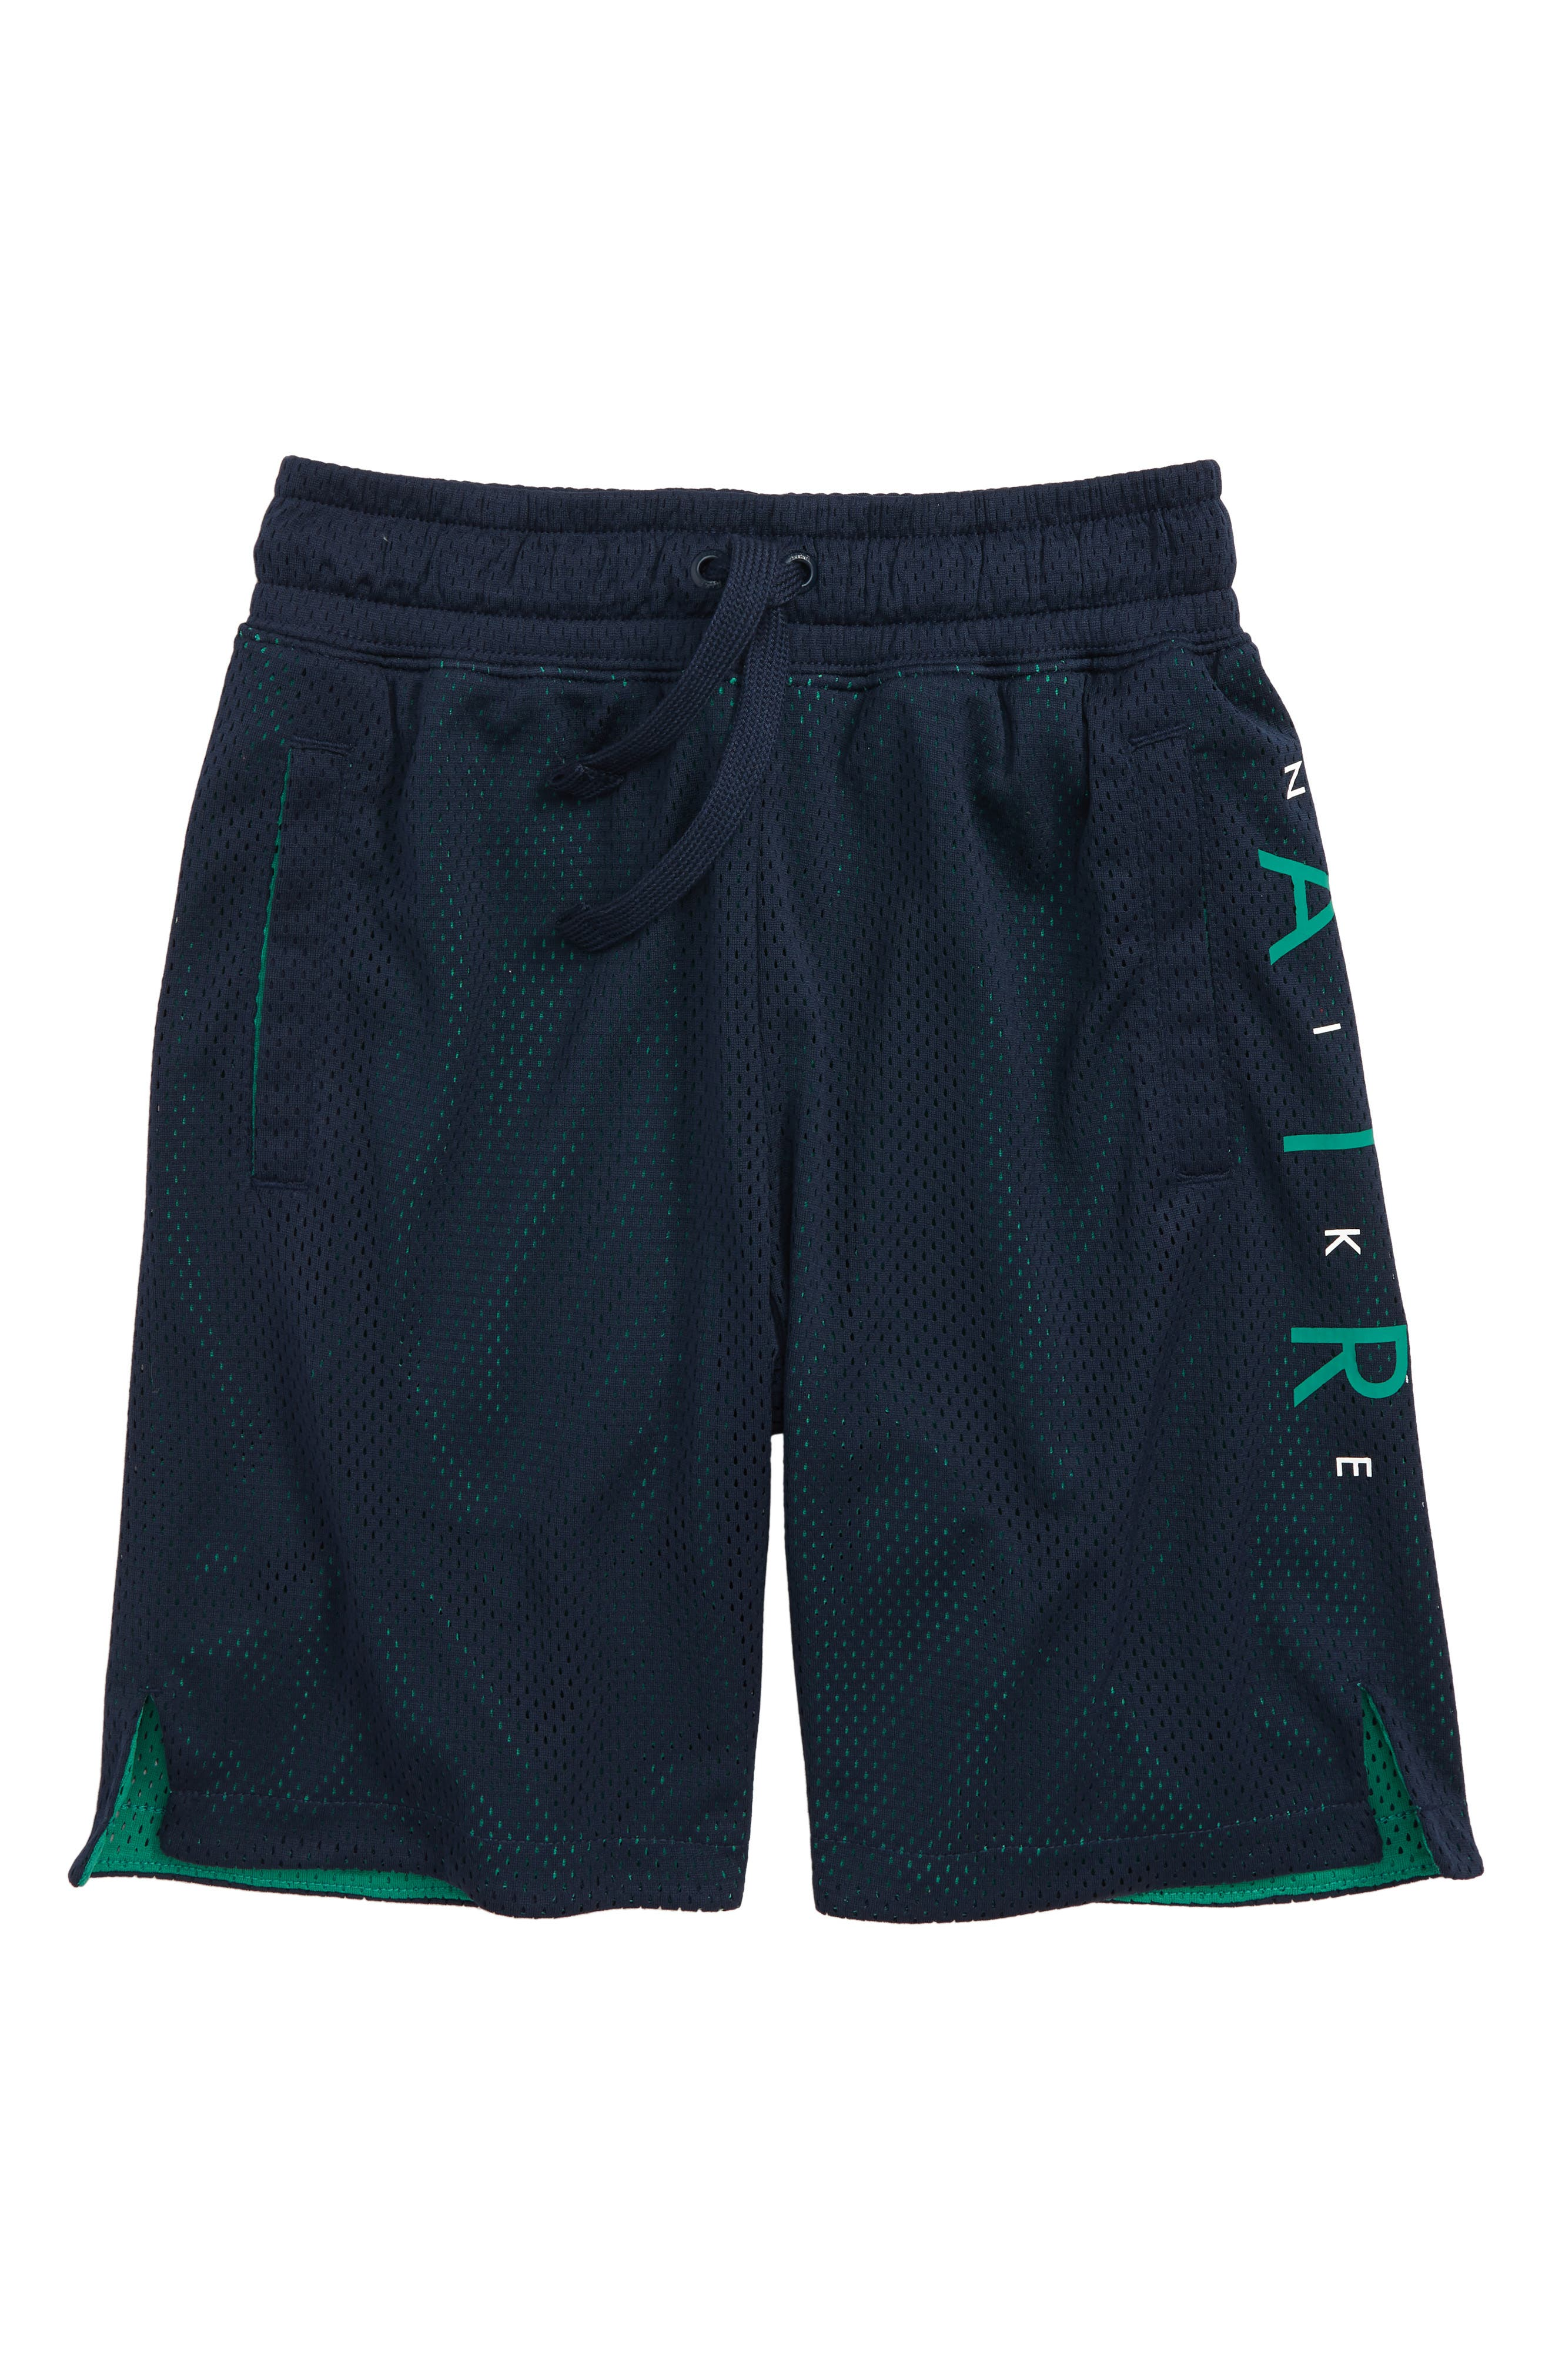 Sportswear Air Knit Shorts,                             Main thumbnail 1, color,                             Obsidian/ Green Noise